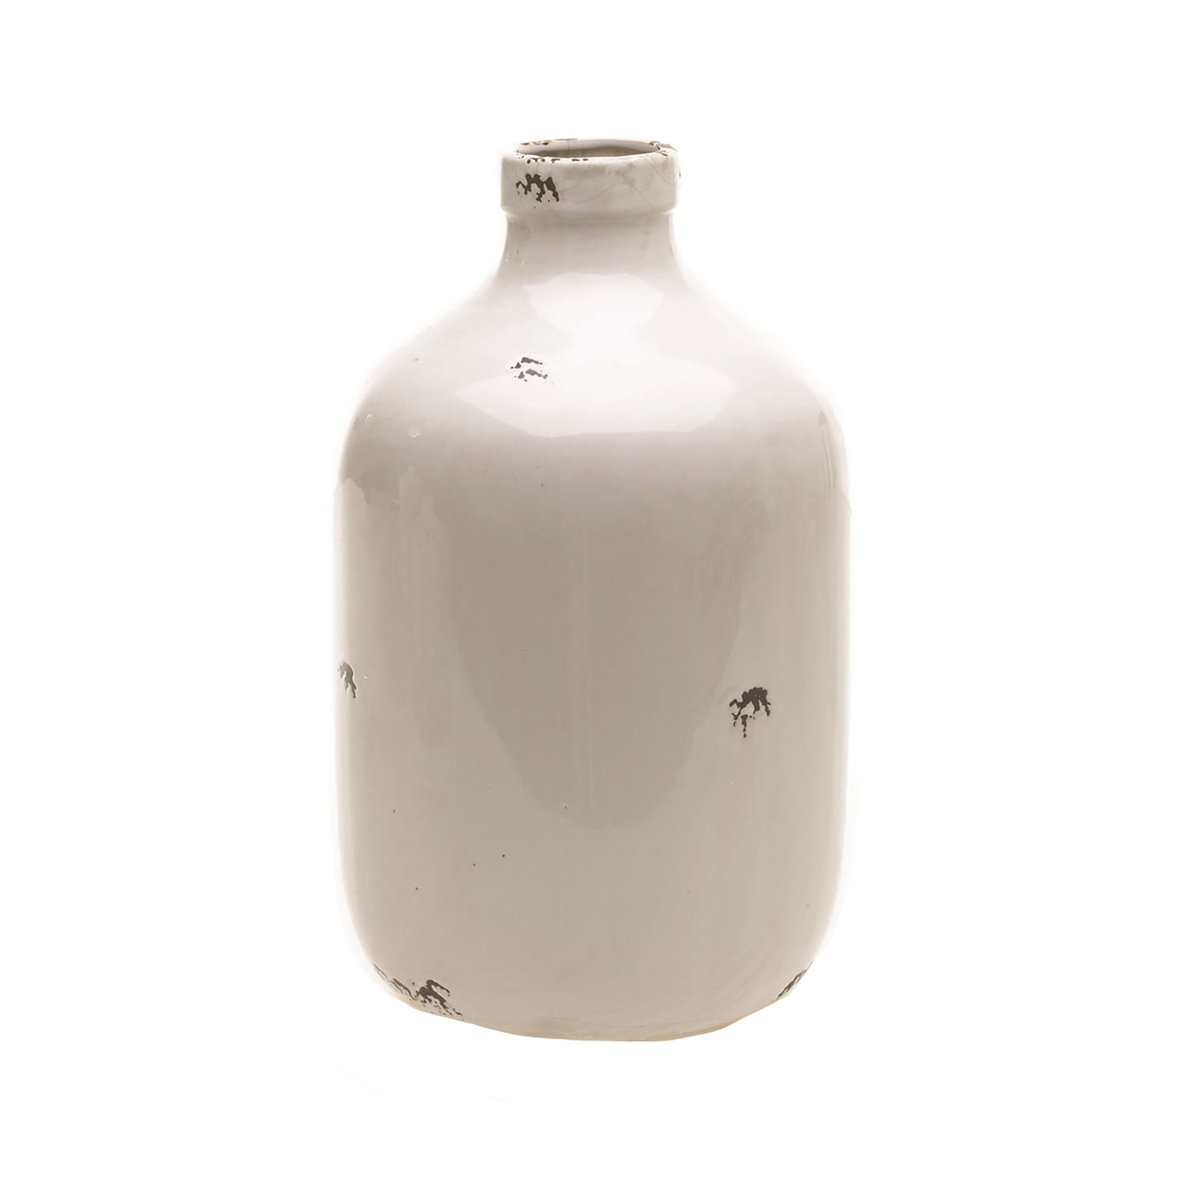 Virginia Vase